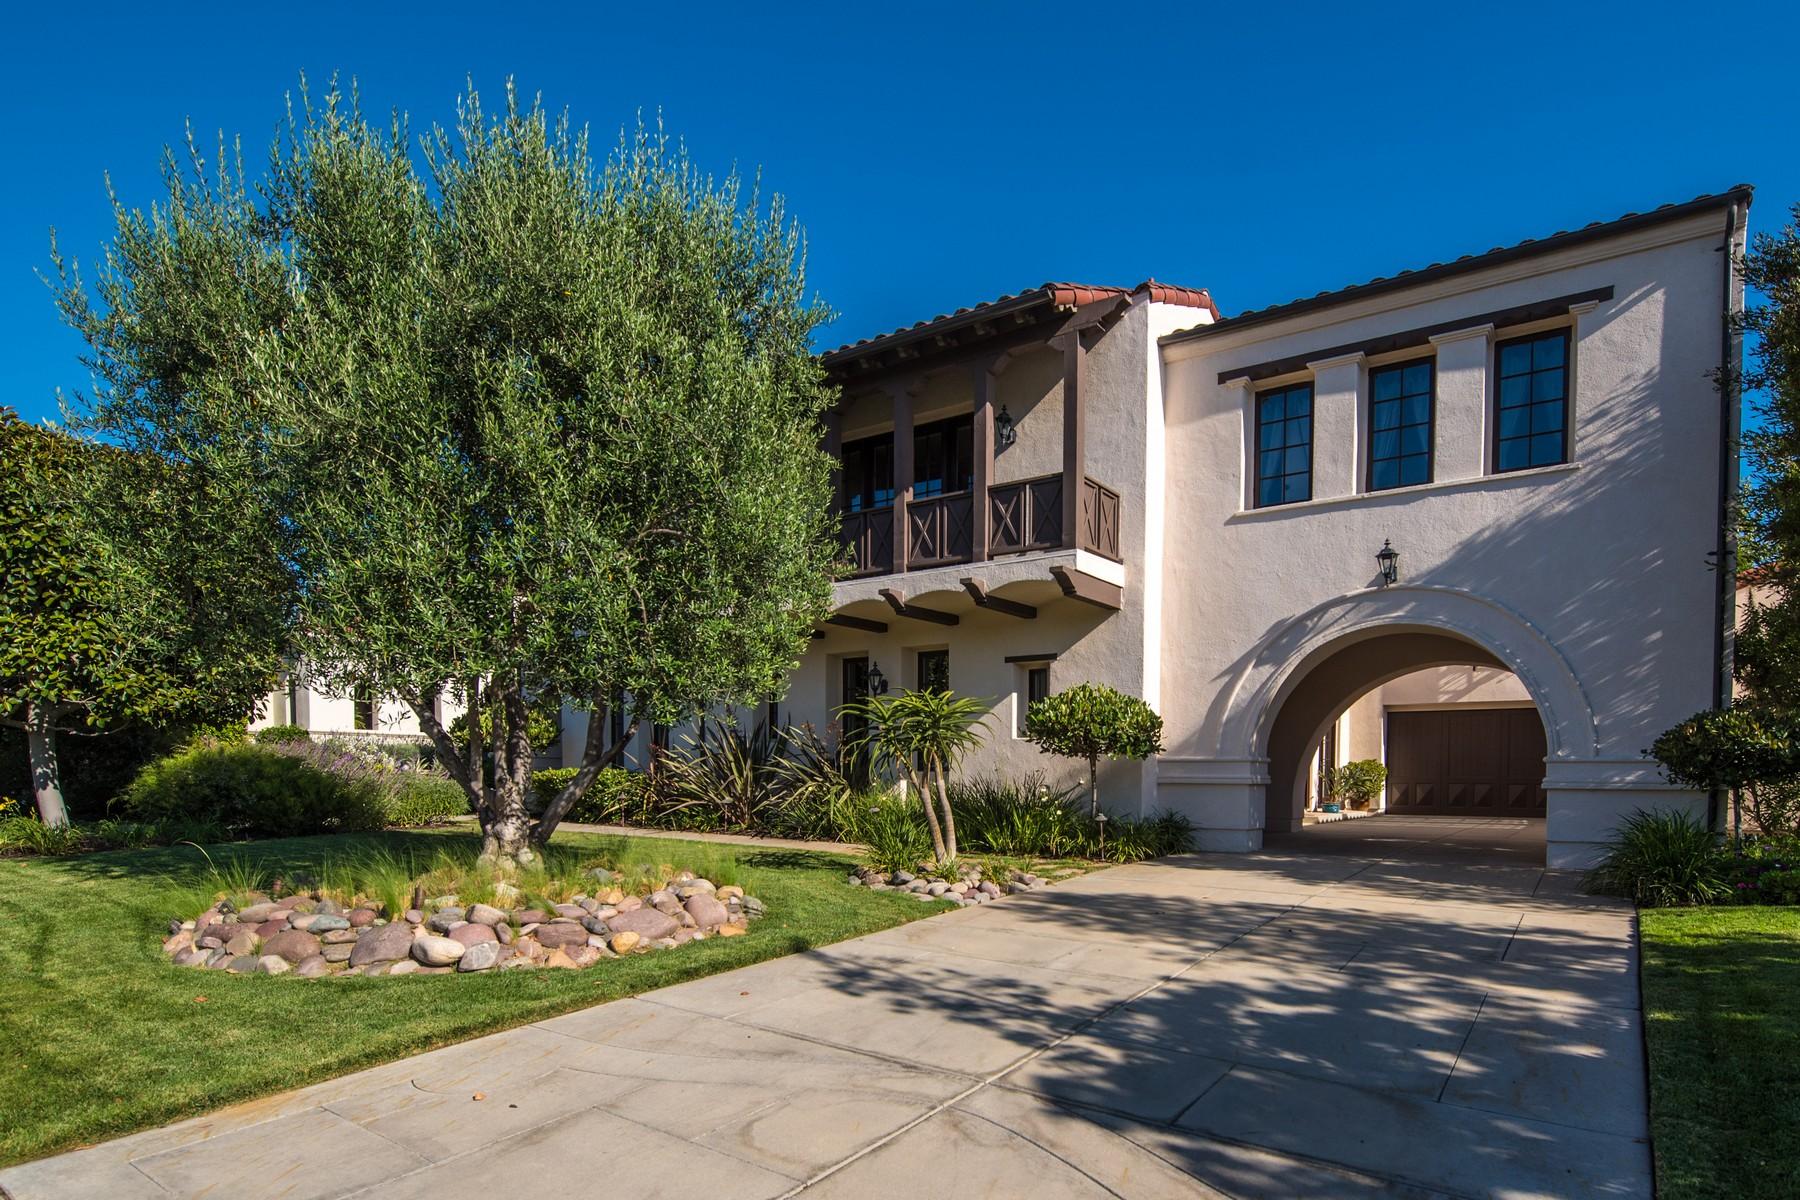 Additional photo for property listing at 8290 Top O The Morning  San Diego, California 92037 Estados Unidos